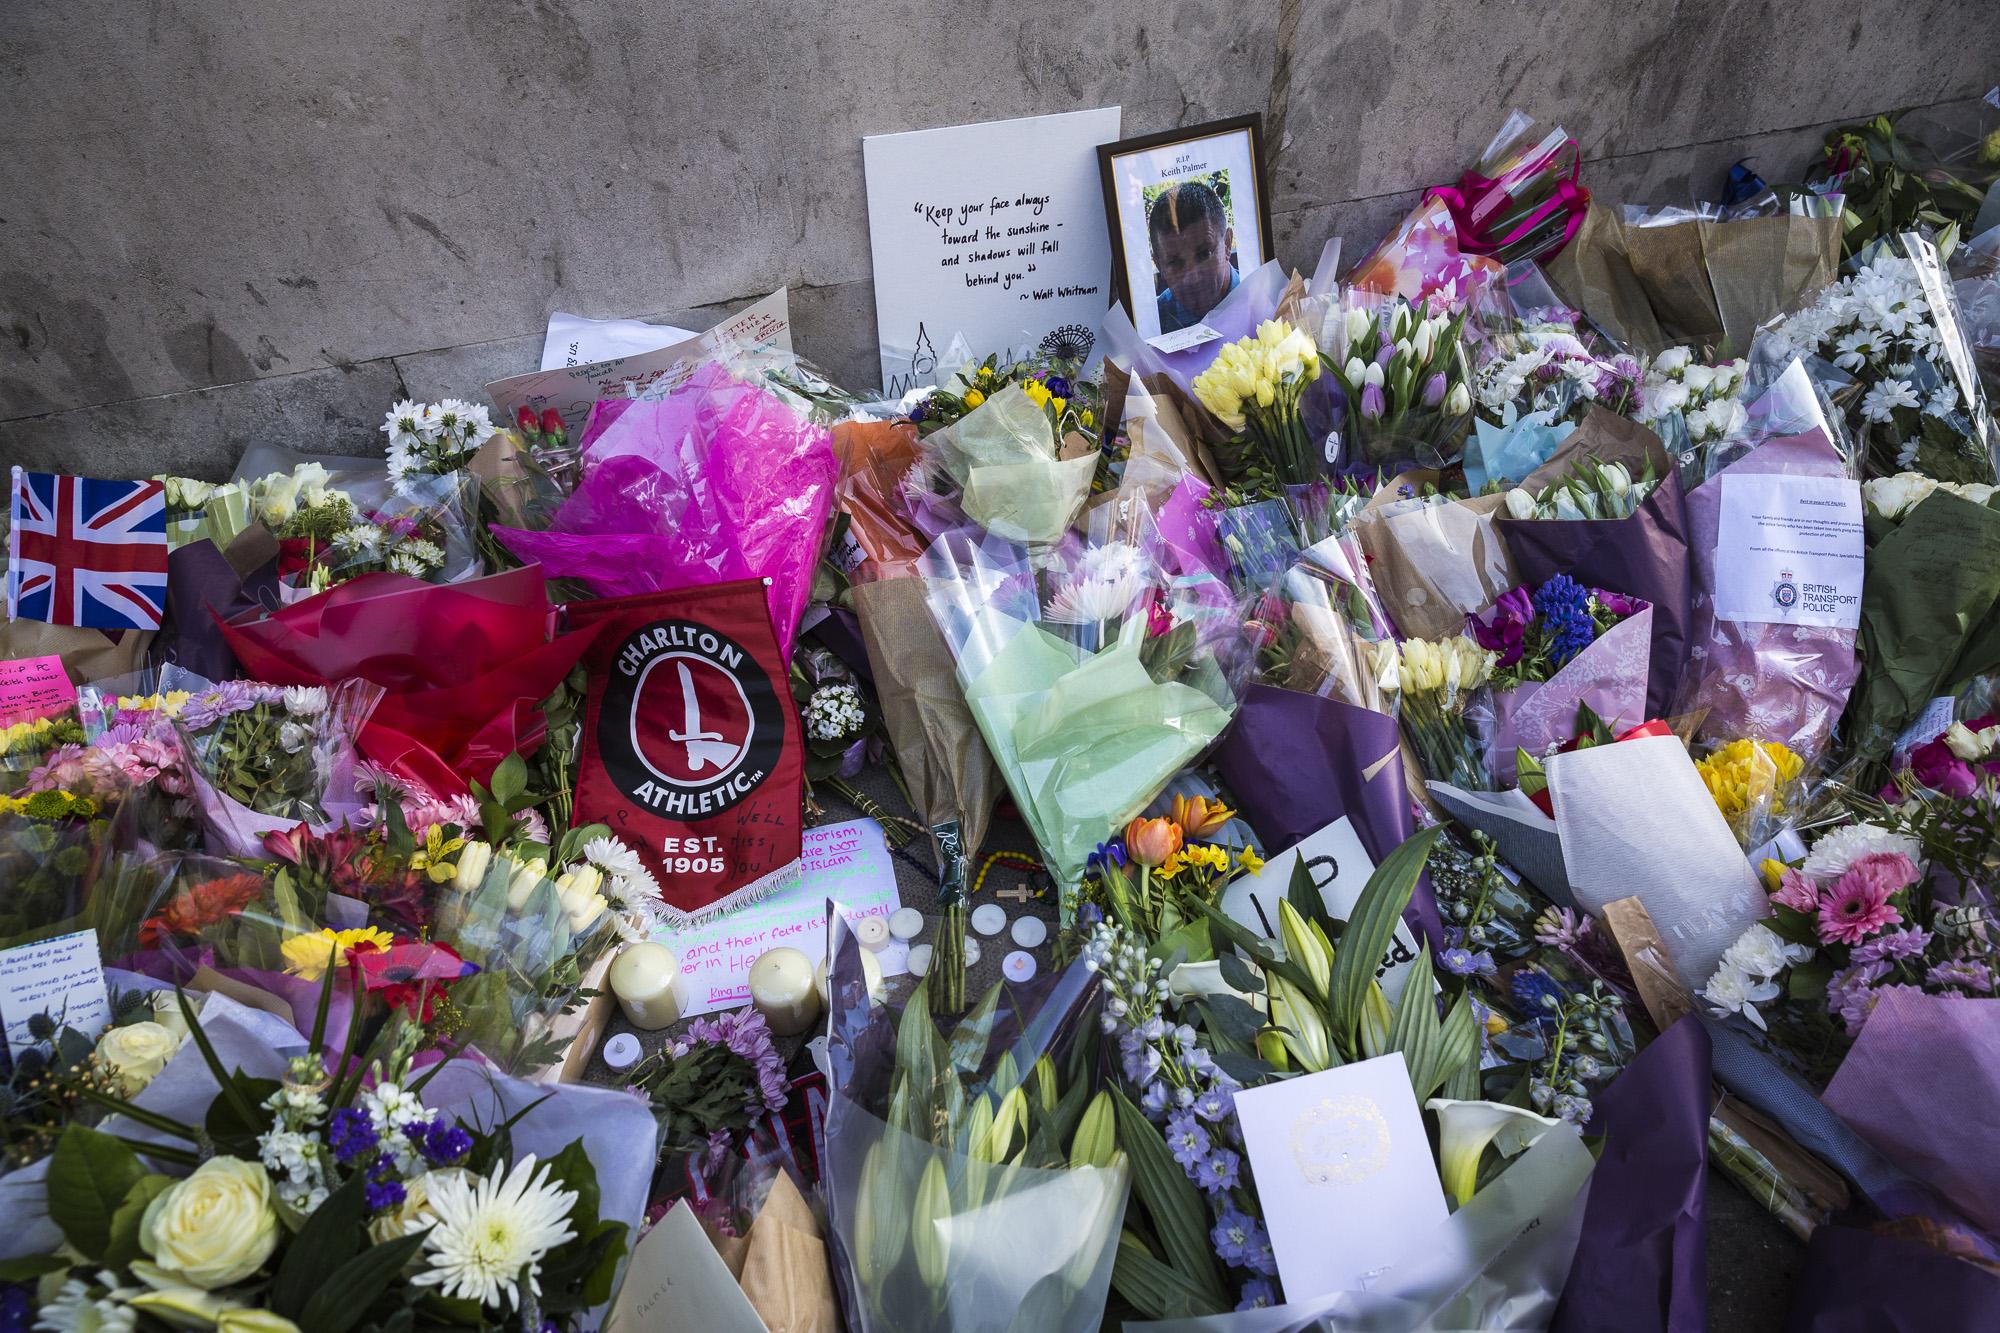 London_Attack_Hope_Not_Hate-26.jpg